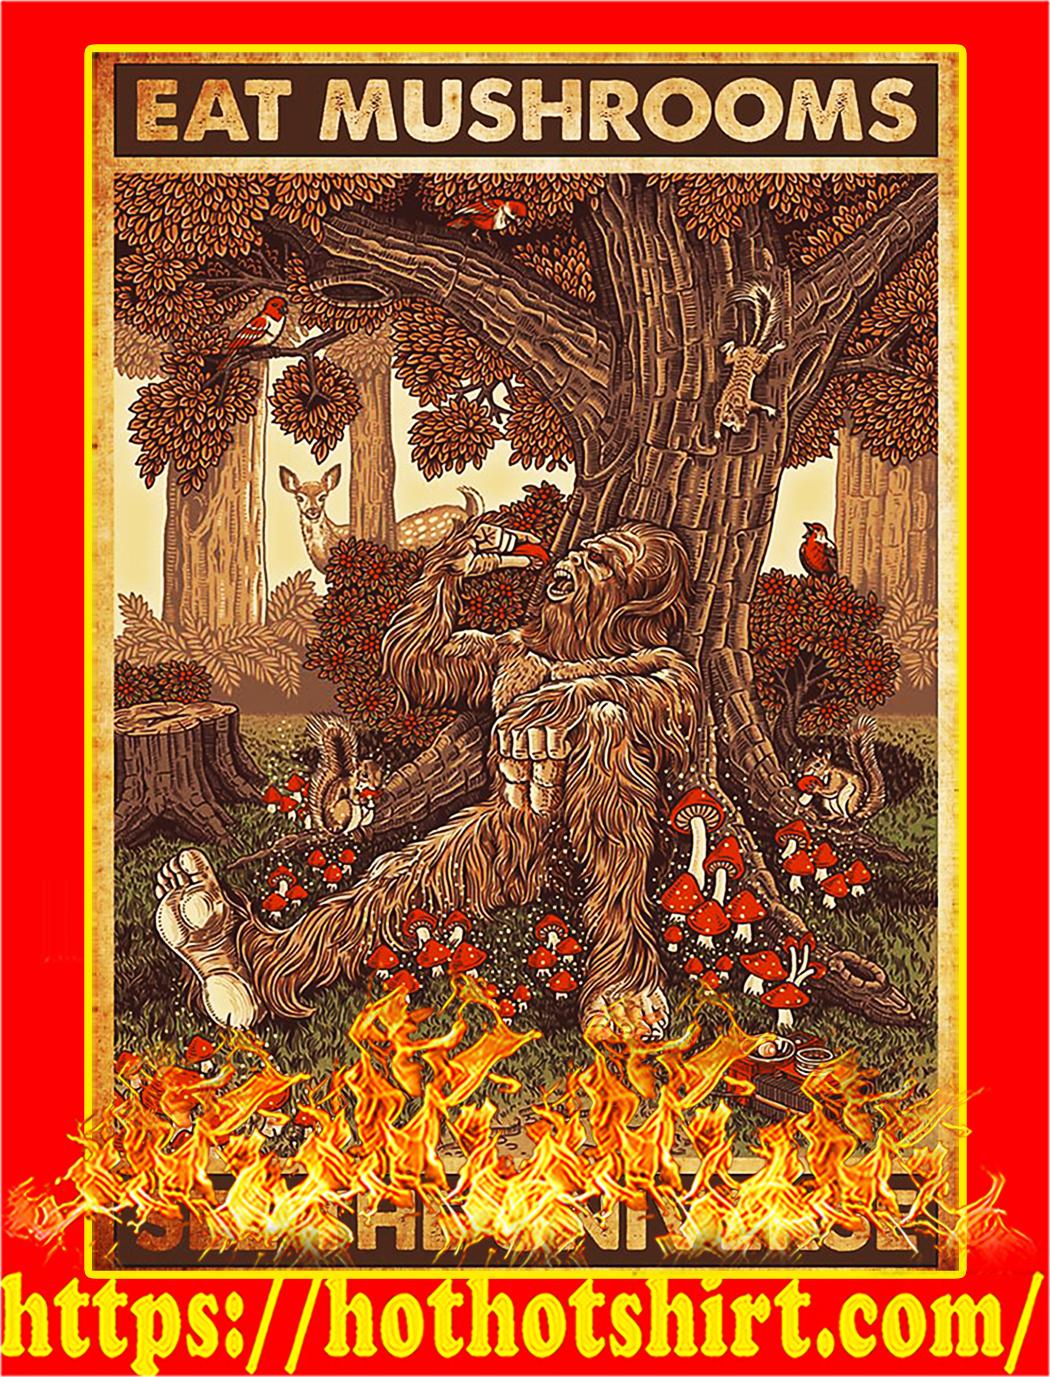 Bigfoot Eat mushrooms see the universe poster - A1